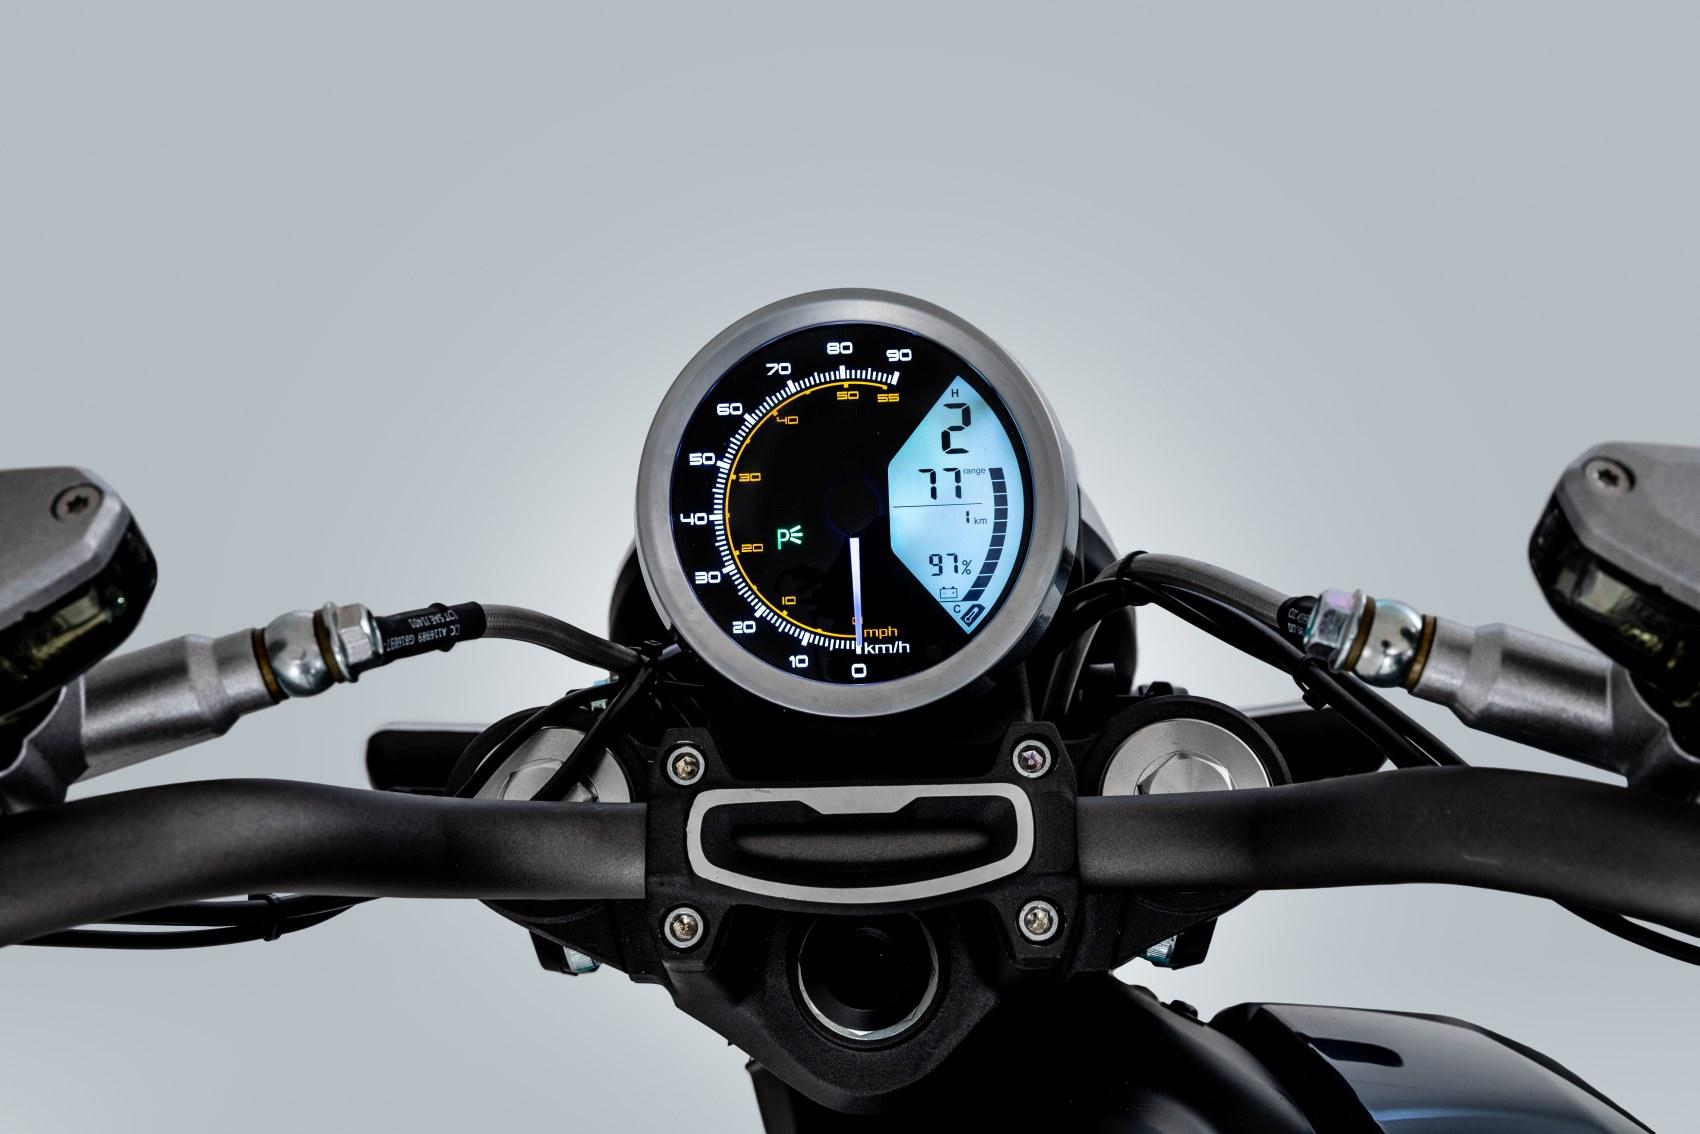 Super Soco TC electric motorcycle digital dash display unit